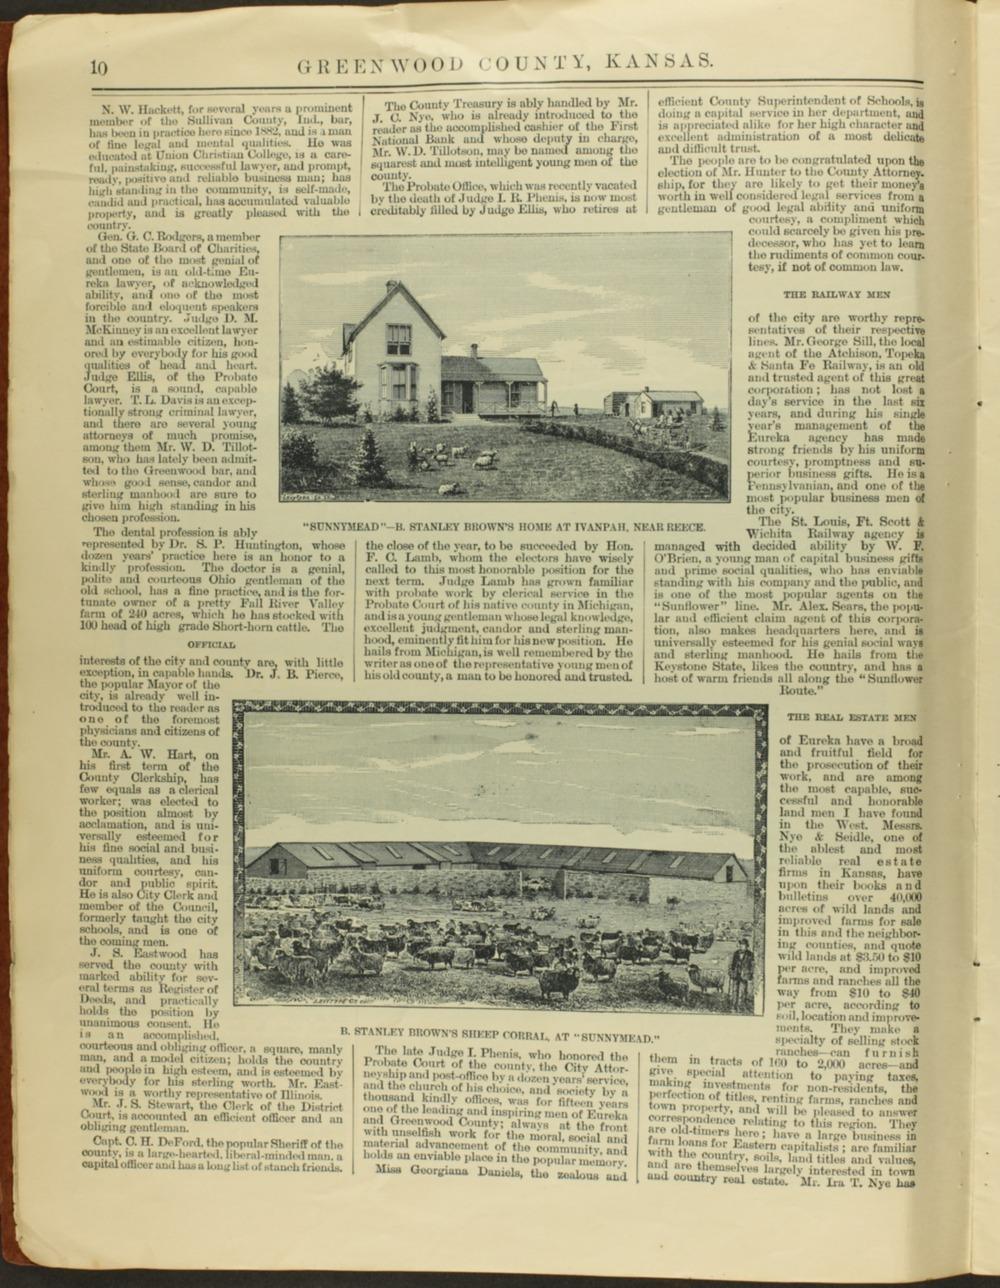 Handbook of Greenwood County, Kansas - 10